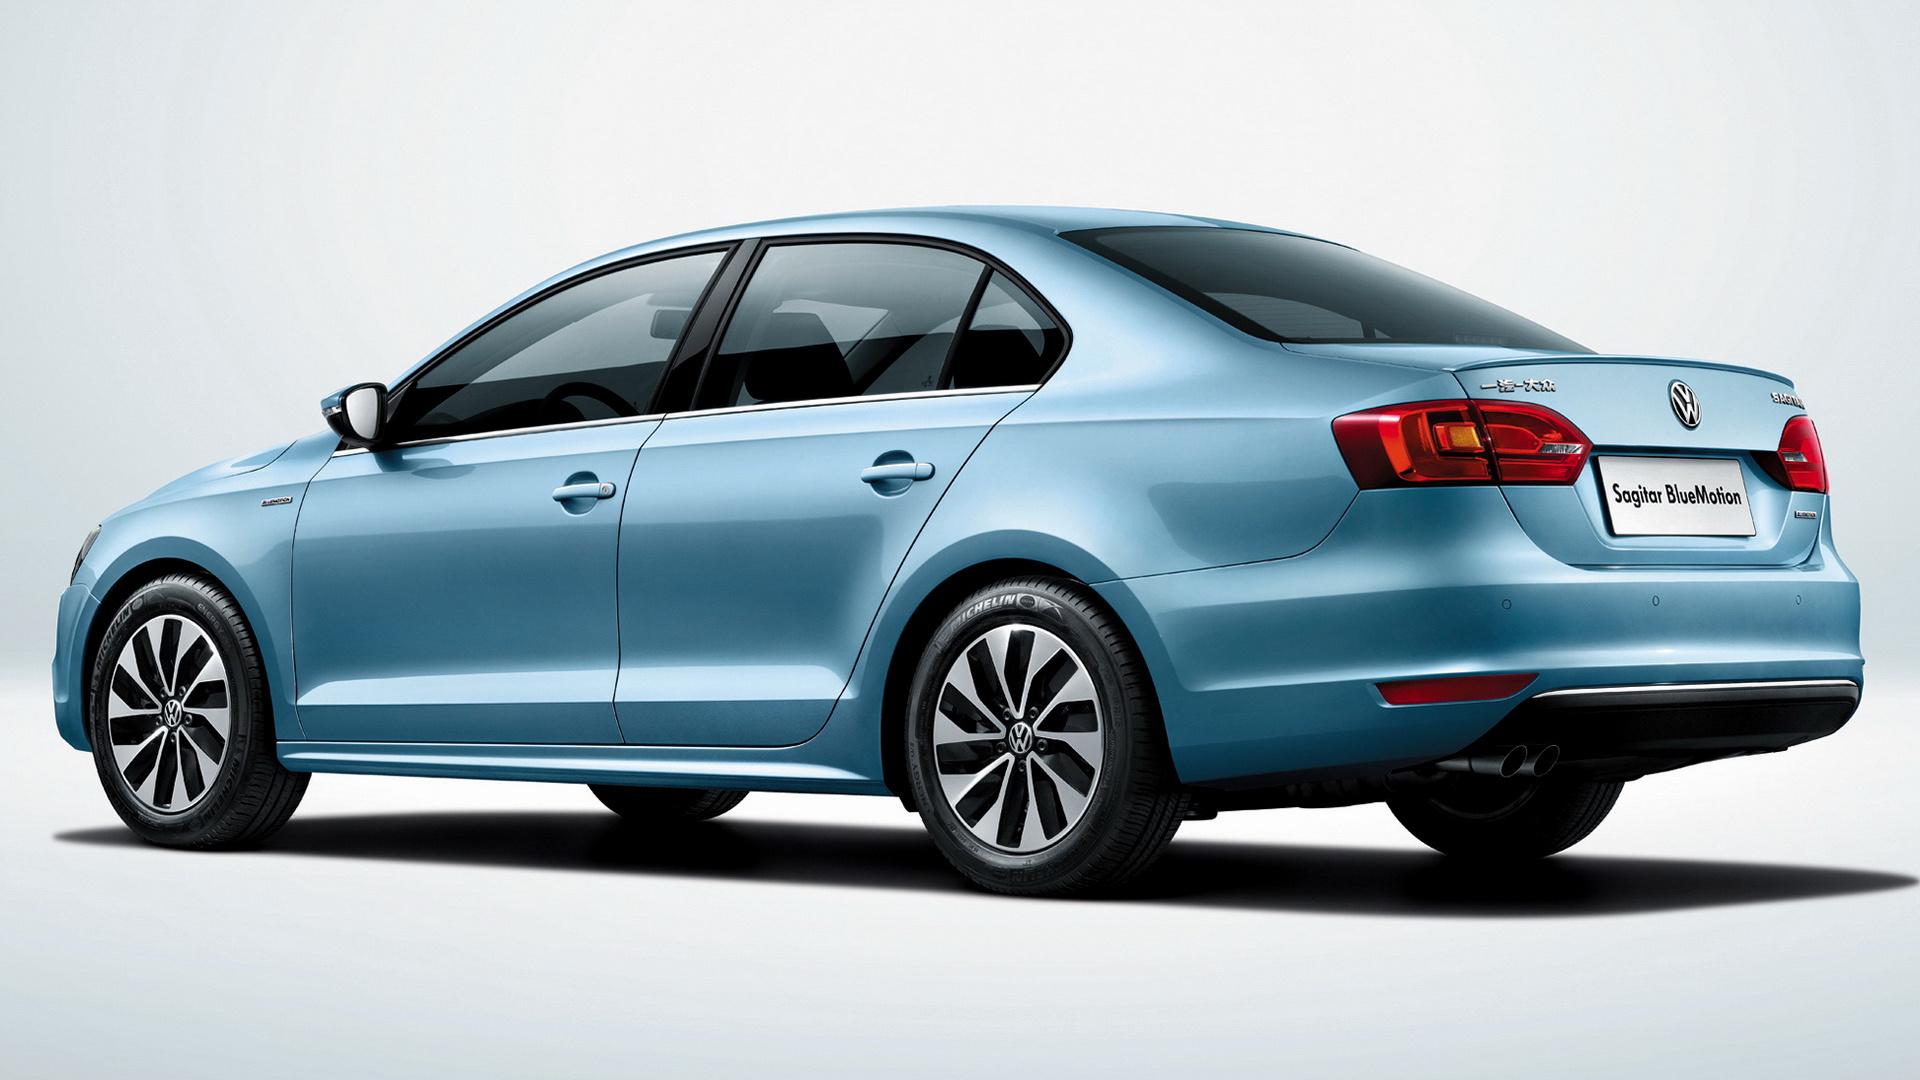 Volkswagen Sagitar (2012) Wallpapers and HD Images - Car Pixel